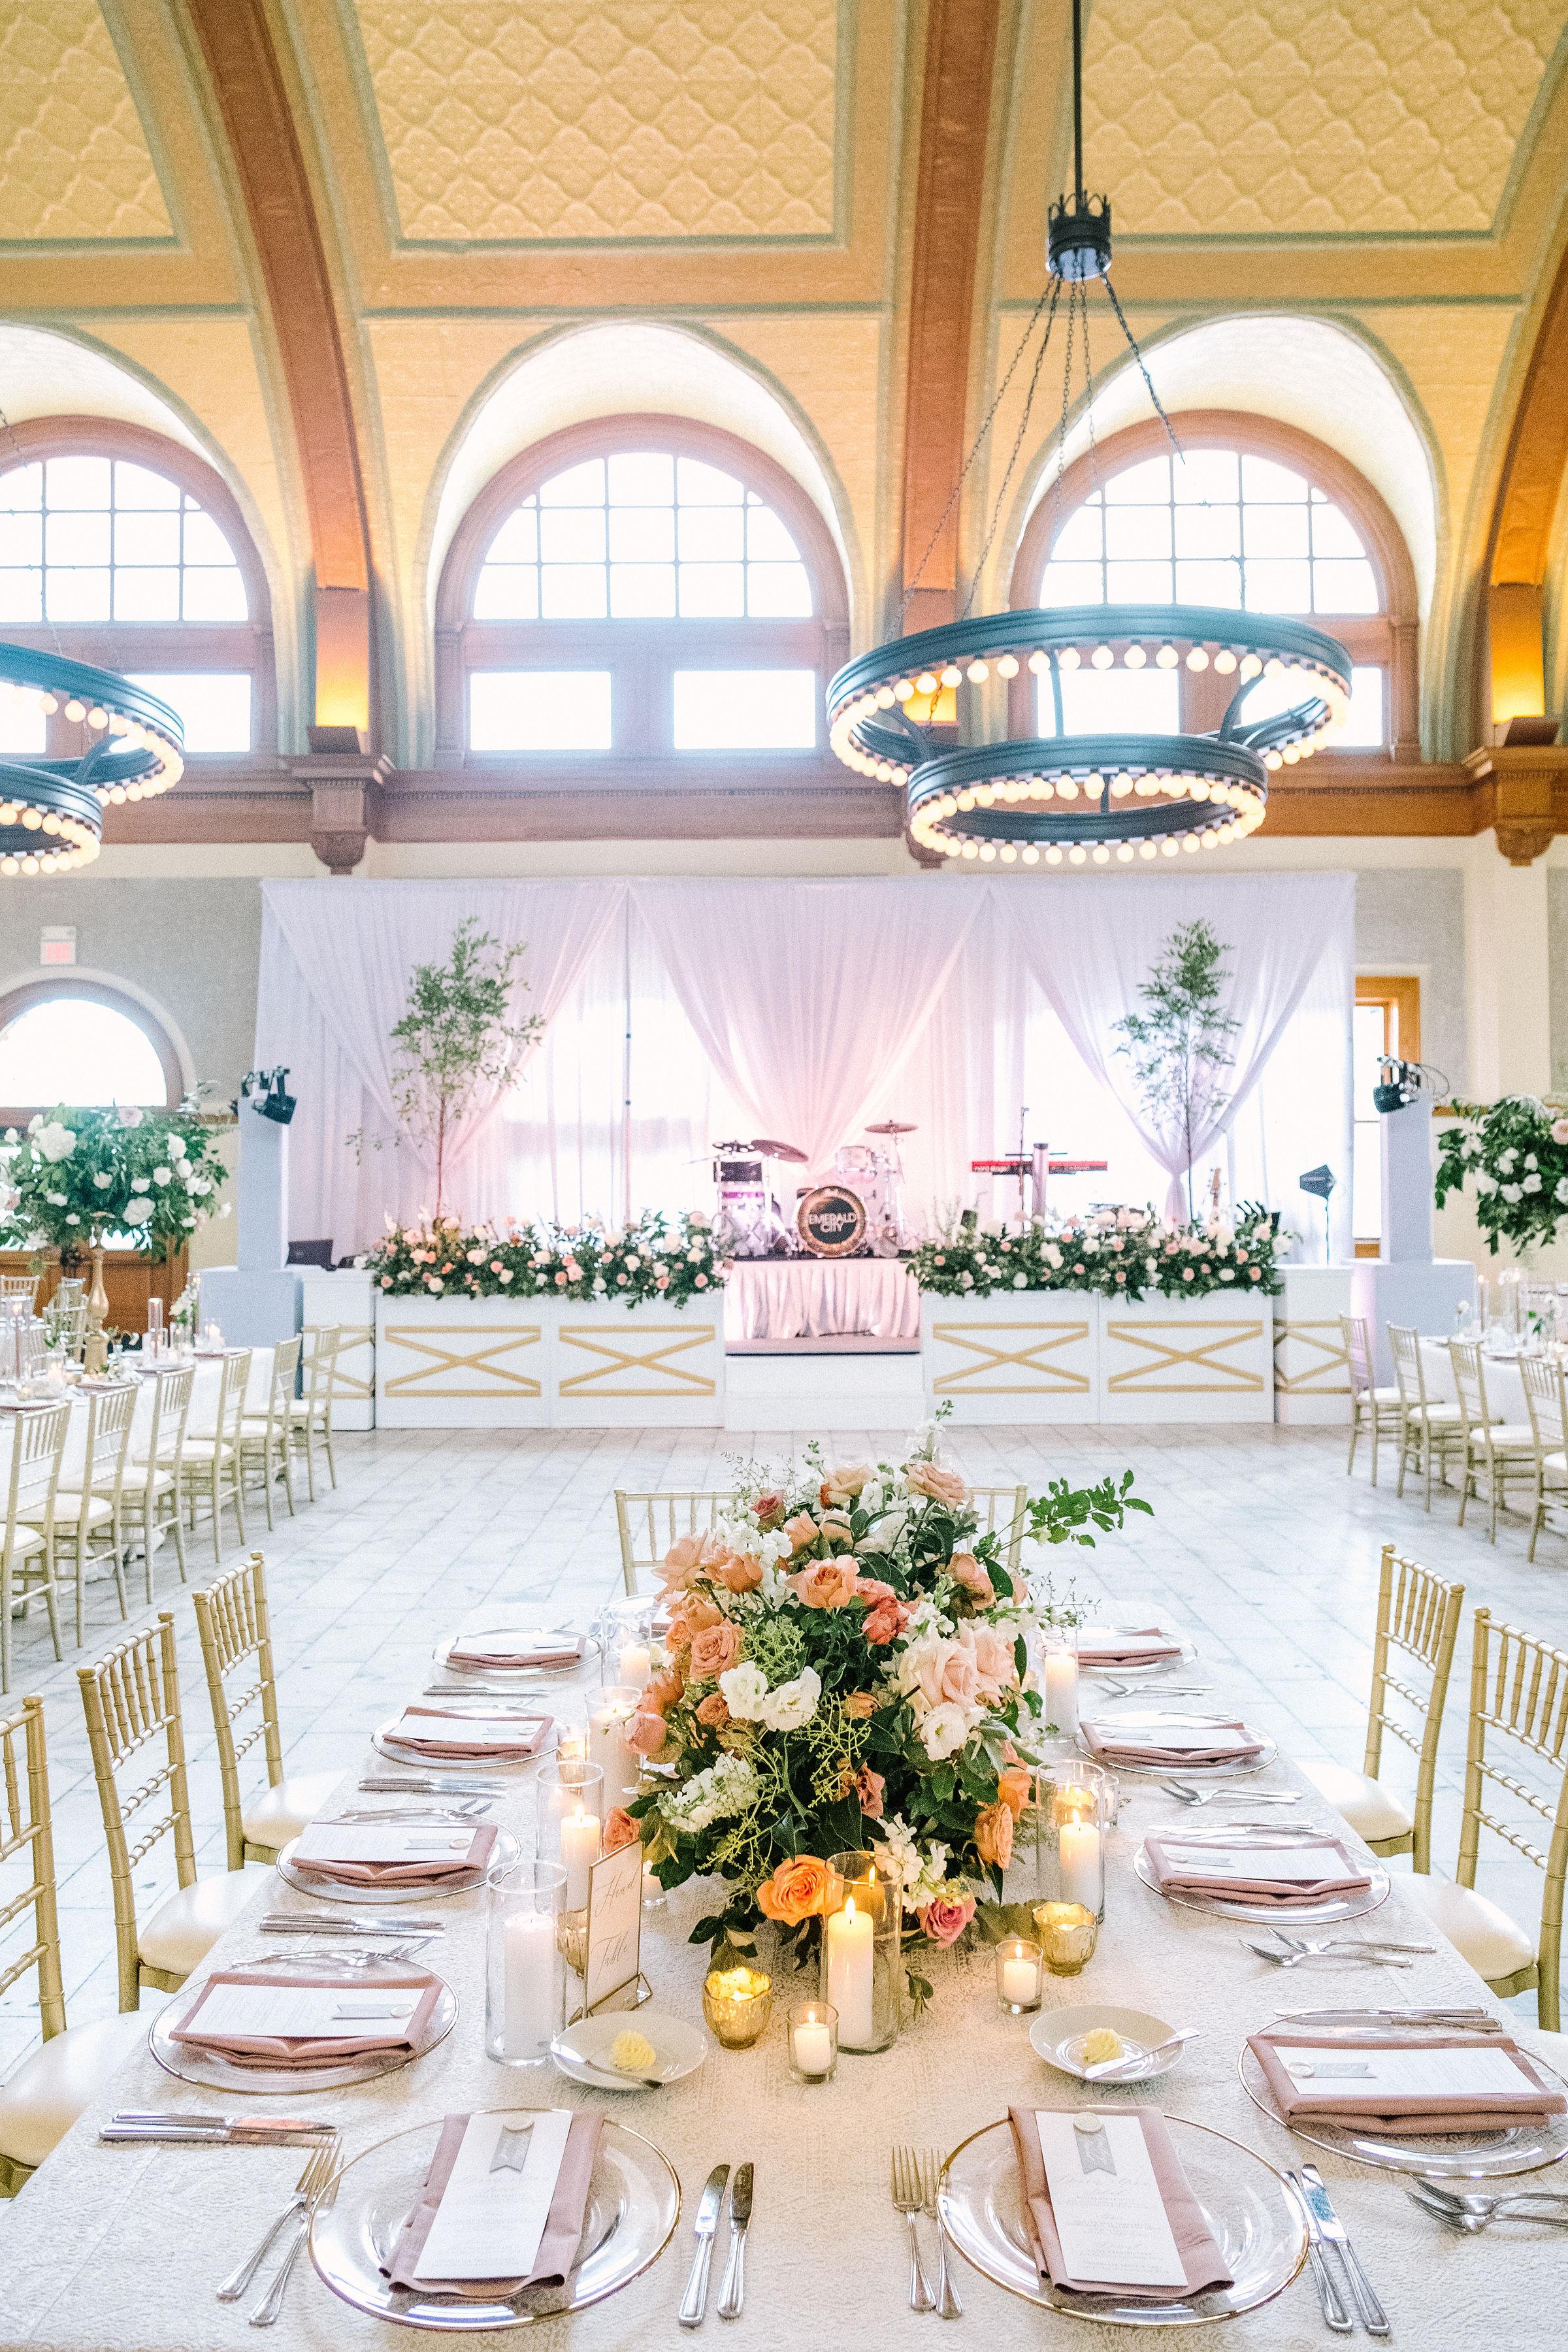 Ellen-Ashton-Photography-Girt-and-gold-events-weddings-Ashton-Depot-Weddings688.jpg